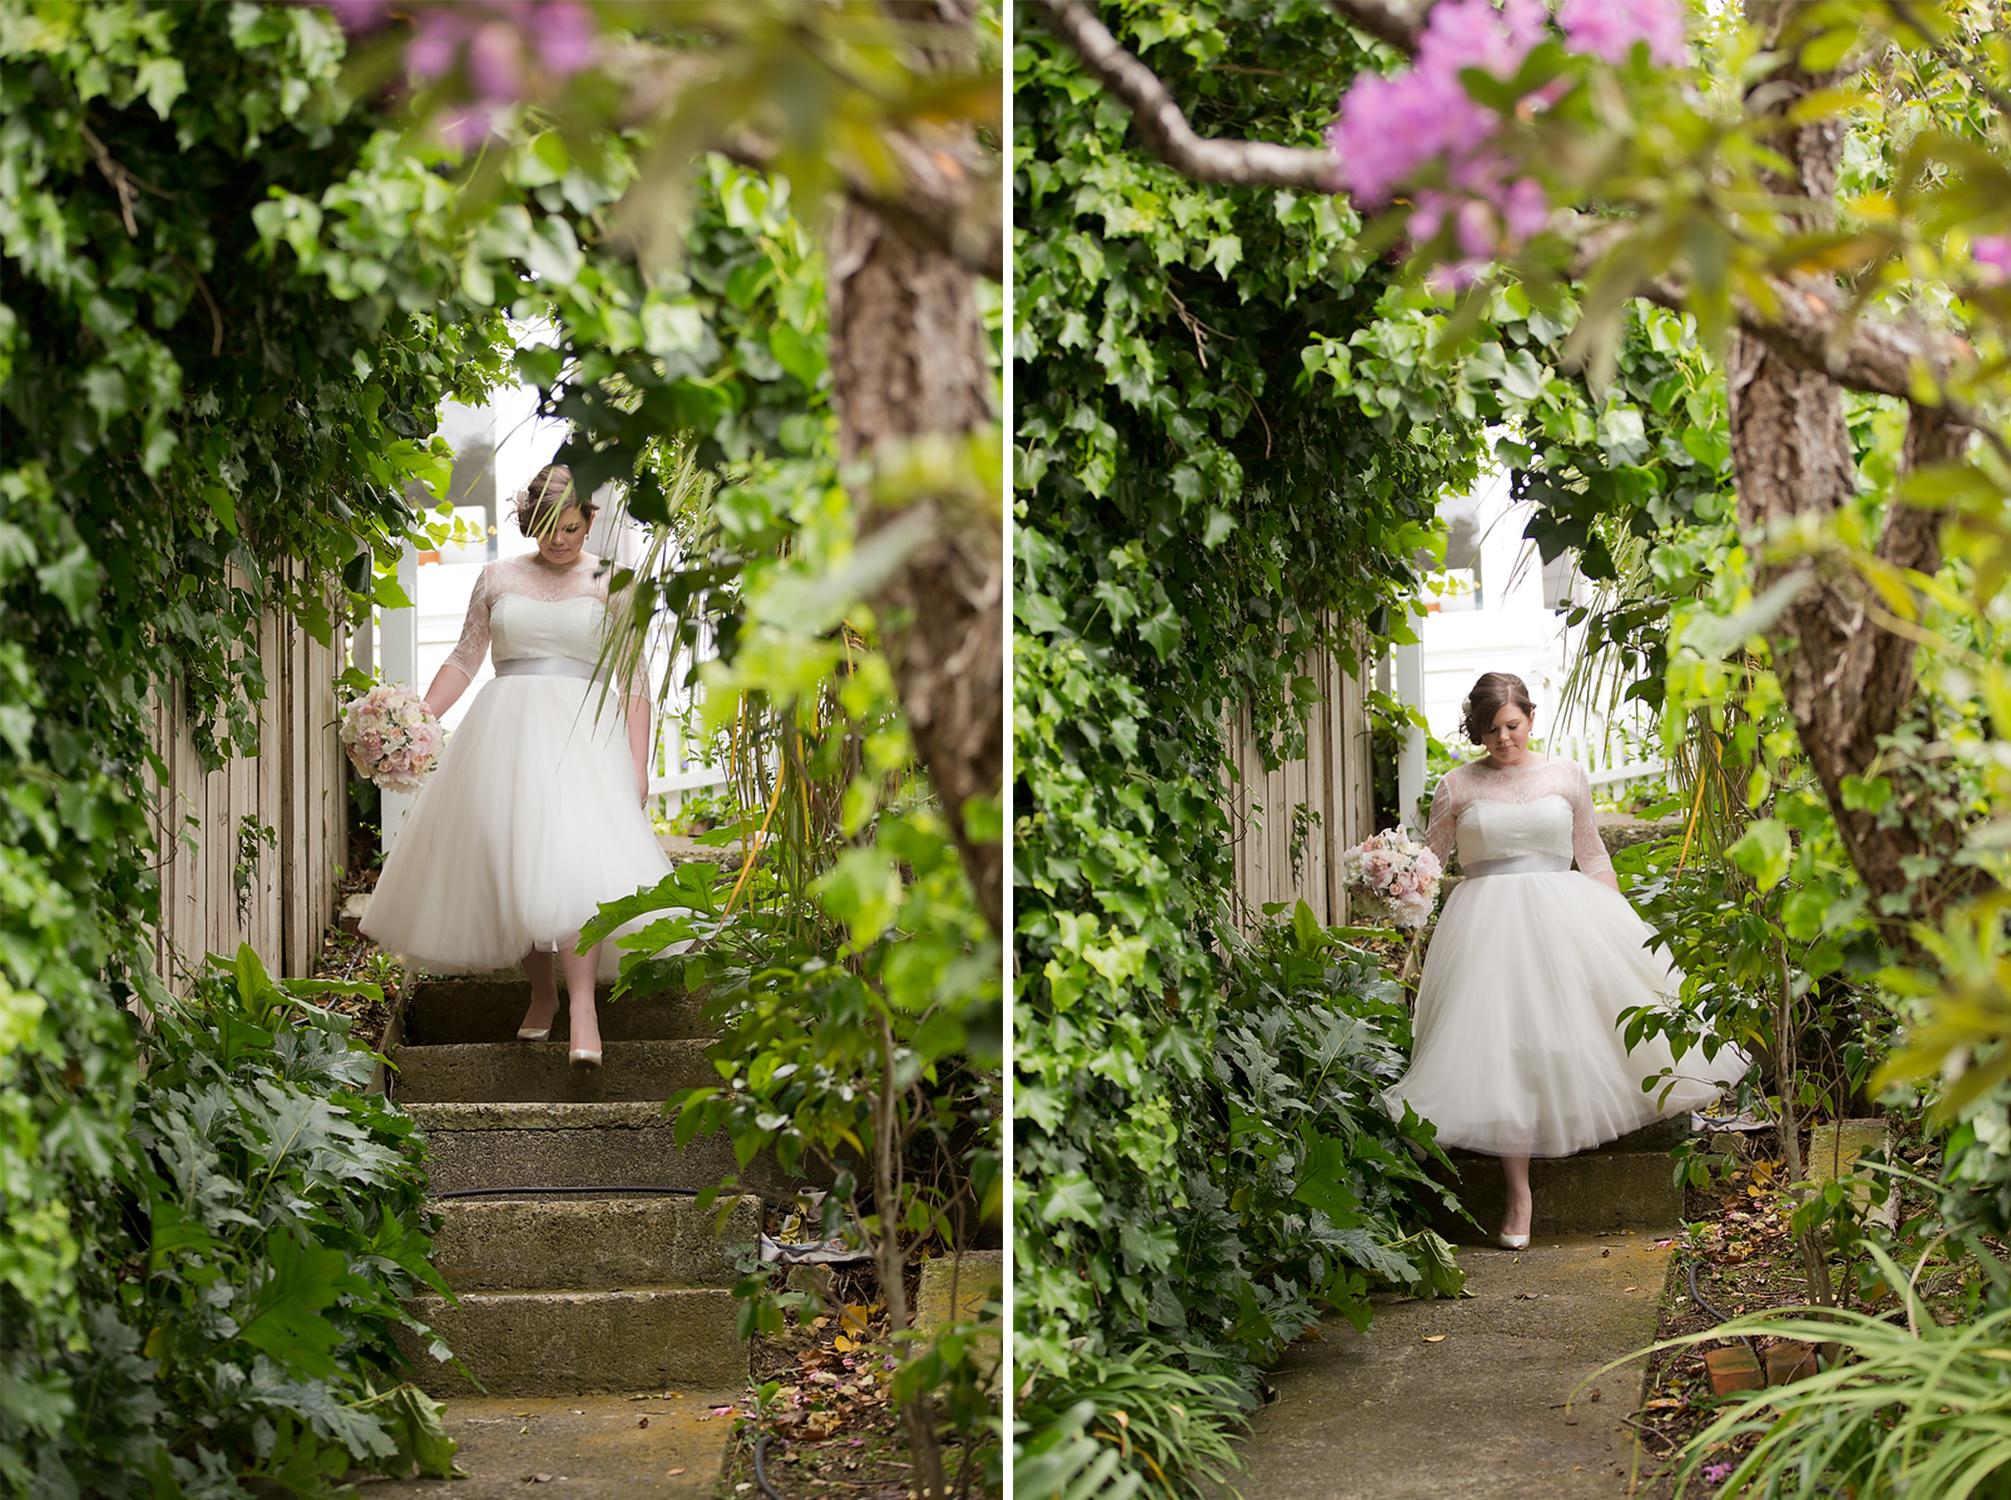 wellington wedding photography NZ - 0310.JPG